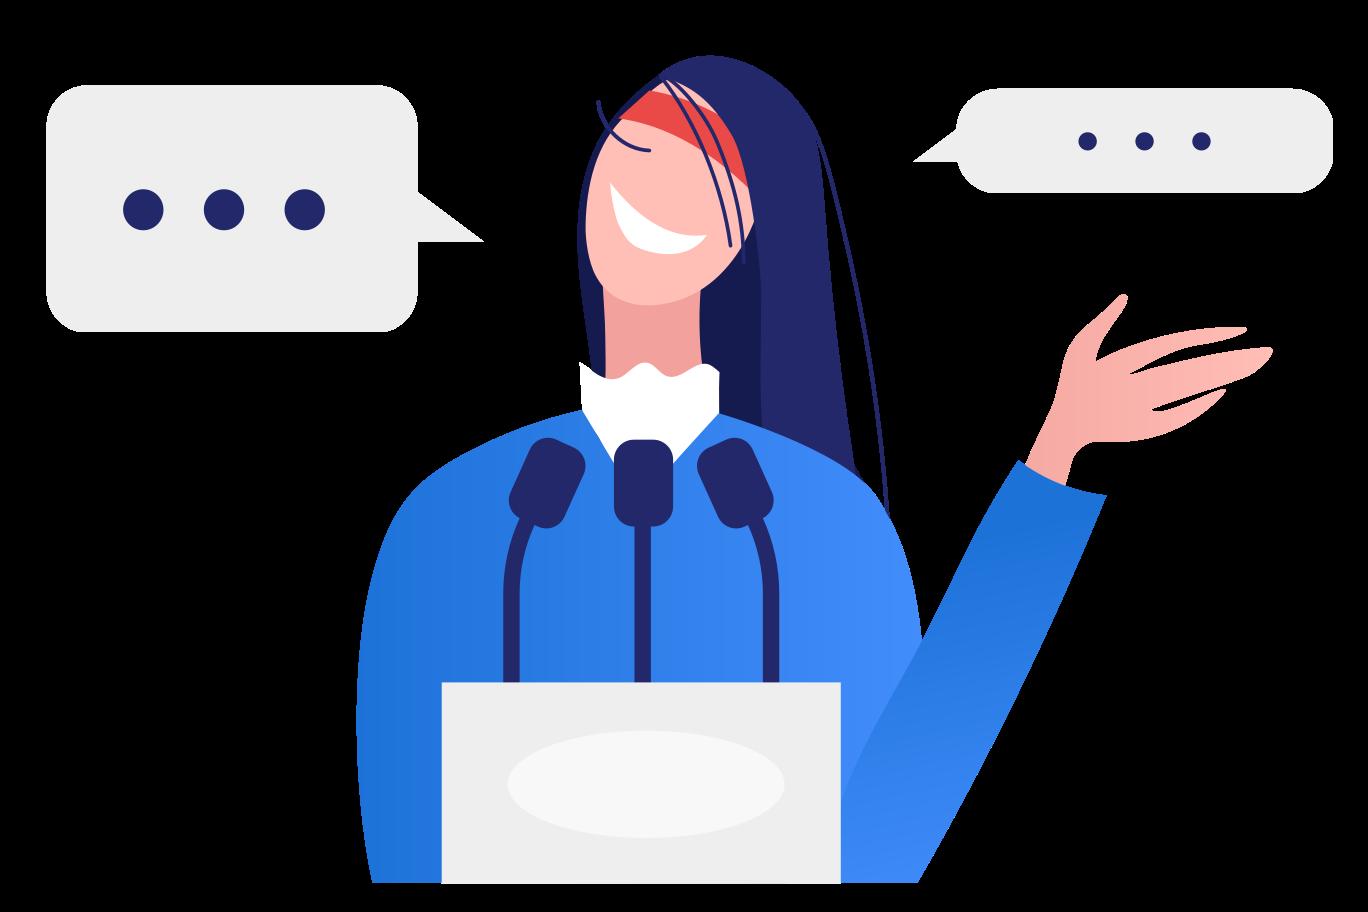 Public speech Clipart illustration in PNG, SVG